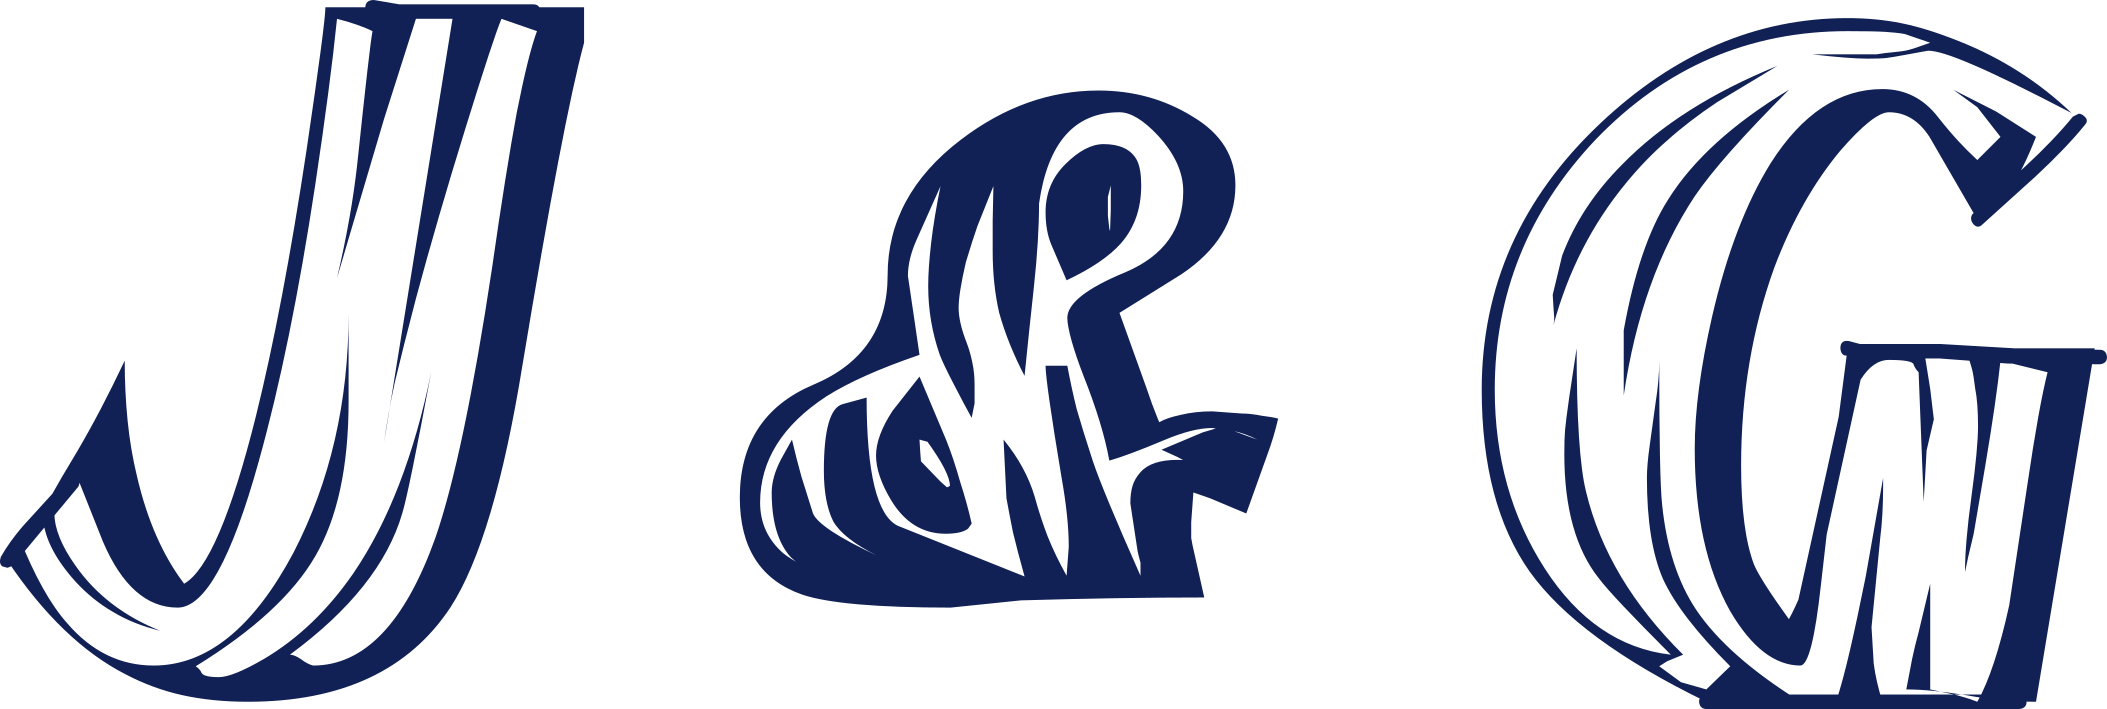 J and G Boutique Homme Rixheim Logo 2020